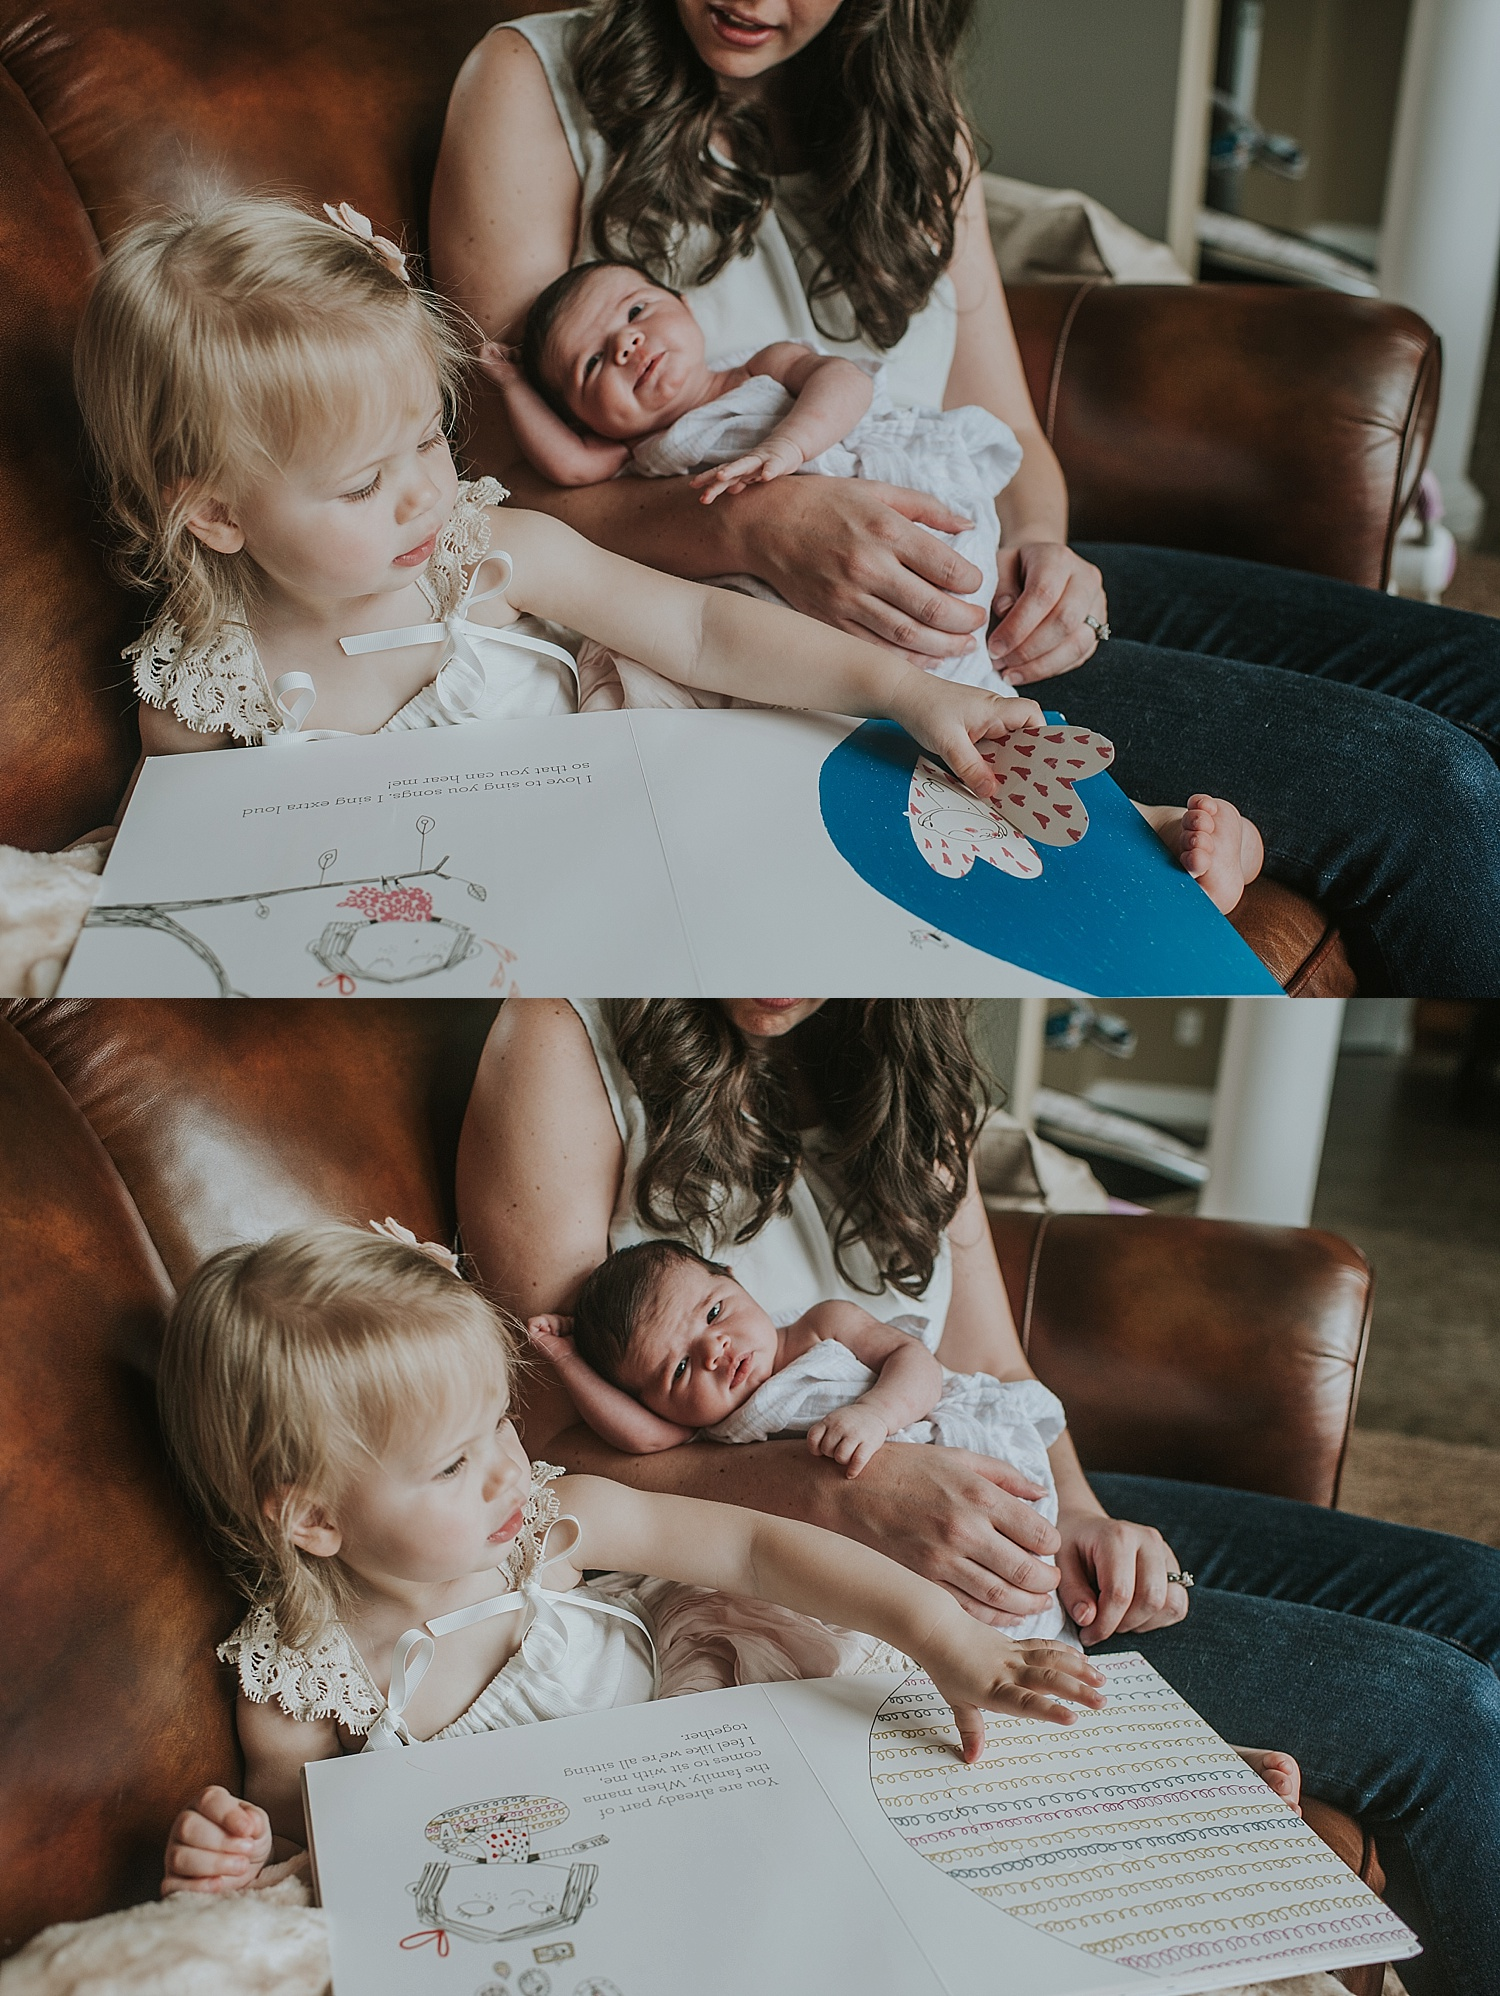 akron-ohio-lifestyle-family-newborn-baby-photographer-lauren-grayson